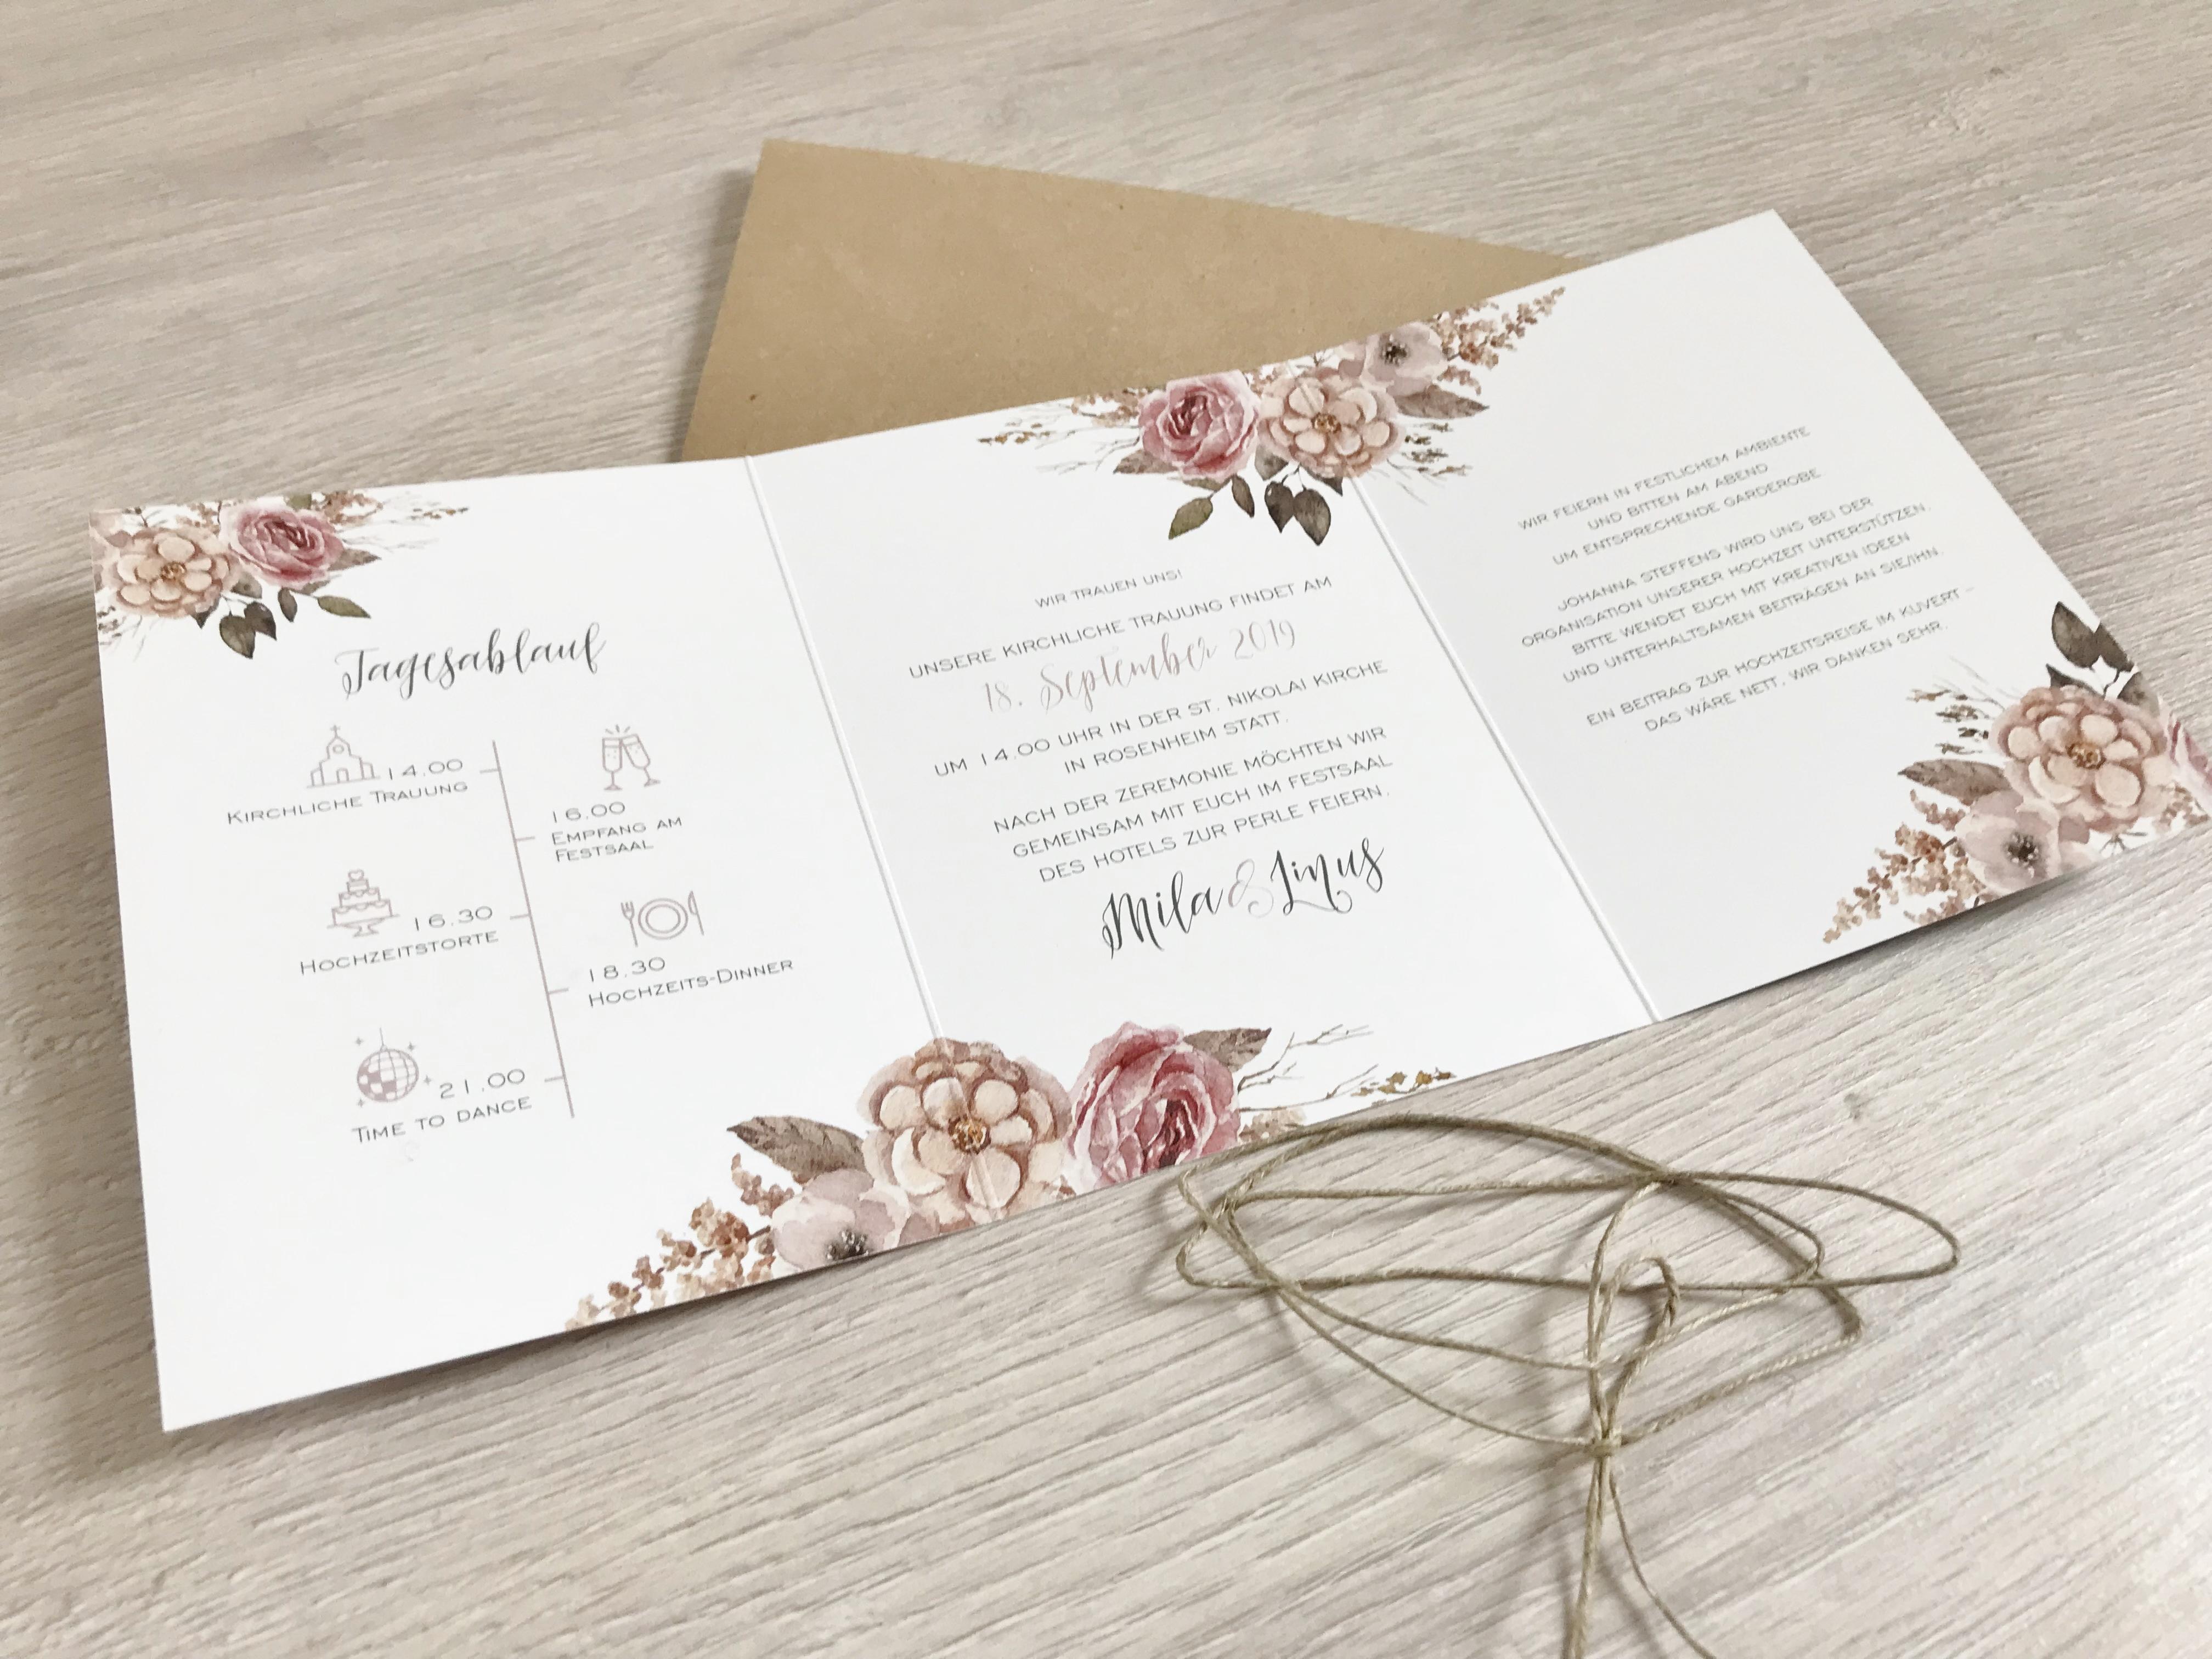 Einladung   Boho/Rustikal   6 Seitig